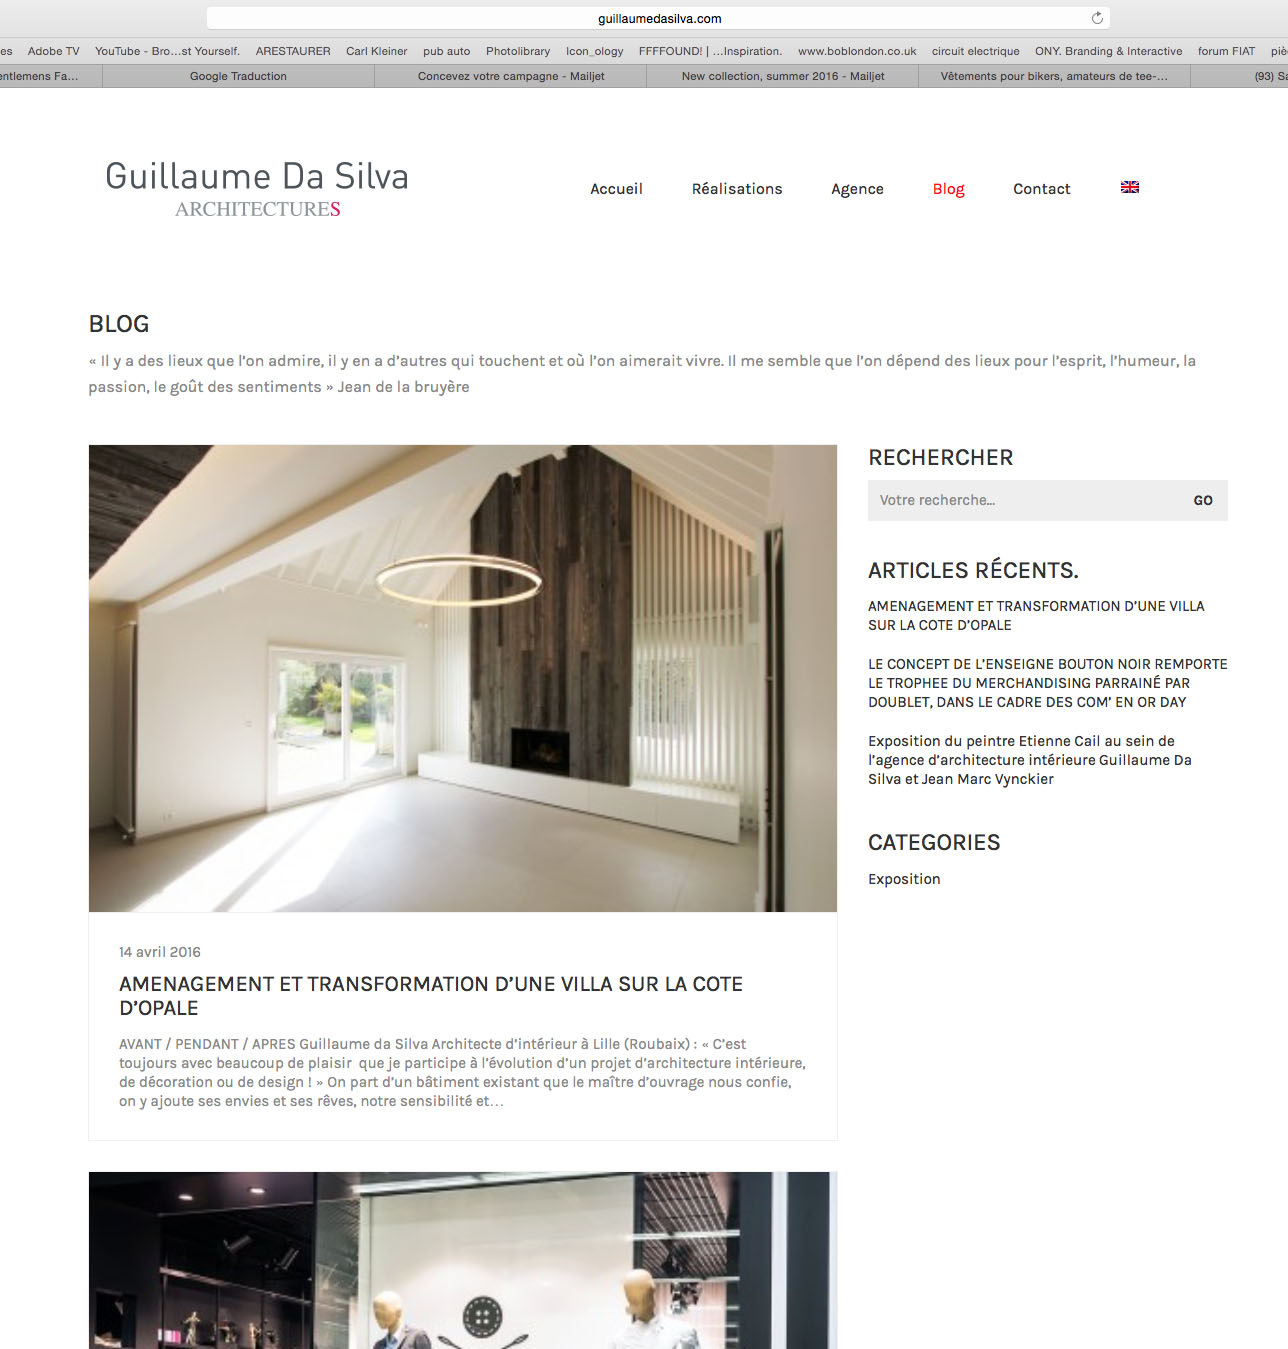 le site web de guillaume da silva une architecture responsive vive la r clame. Black Bedroom Furniture Sets. Home Design Ideas